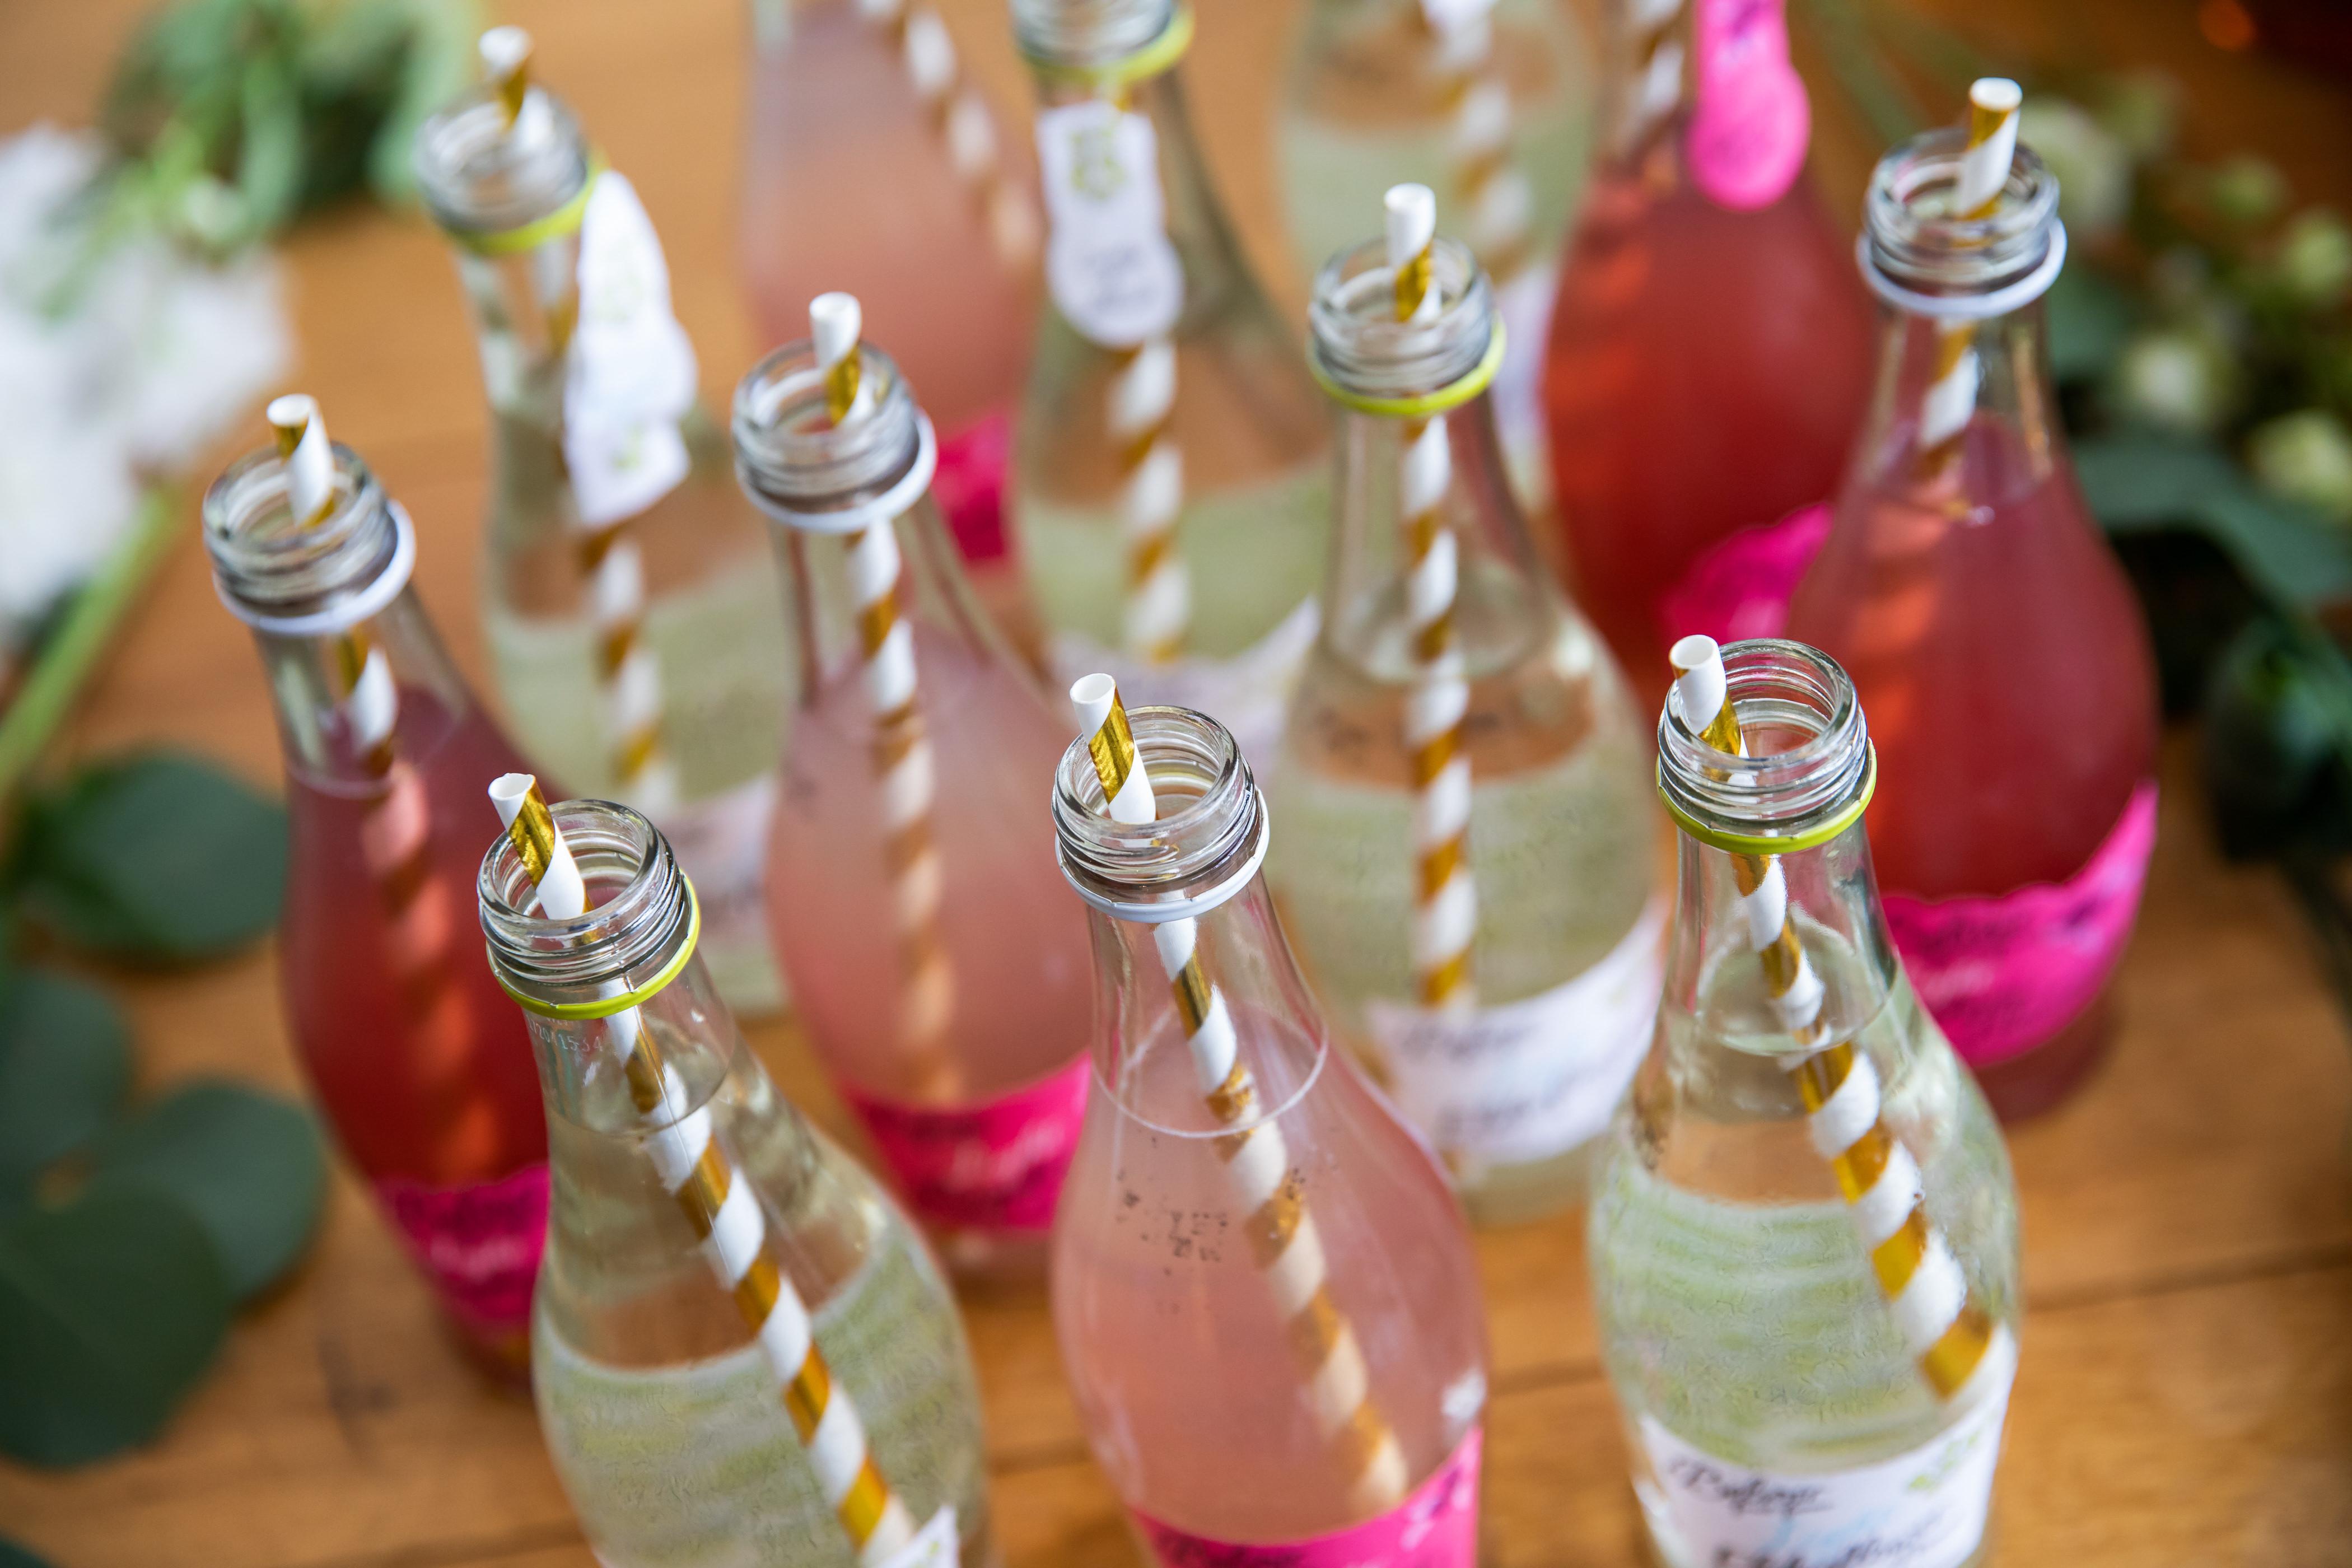 Soft Drinks with straws